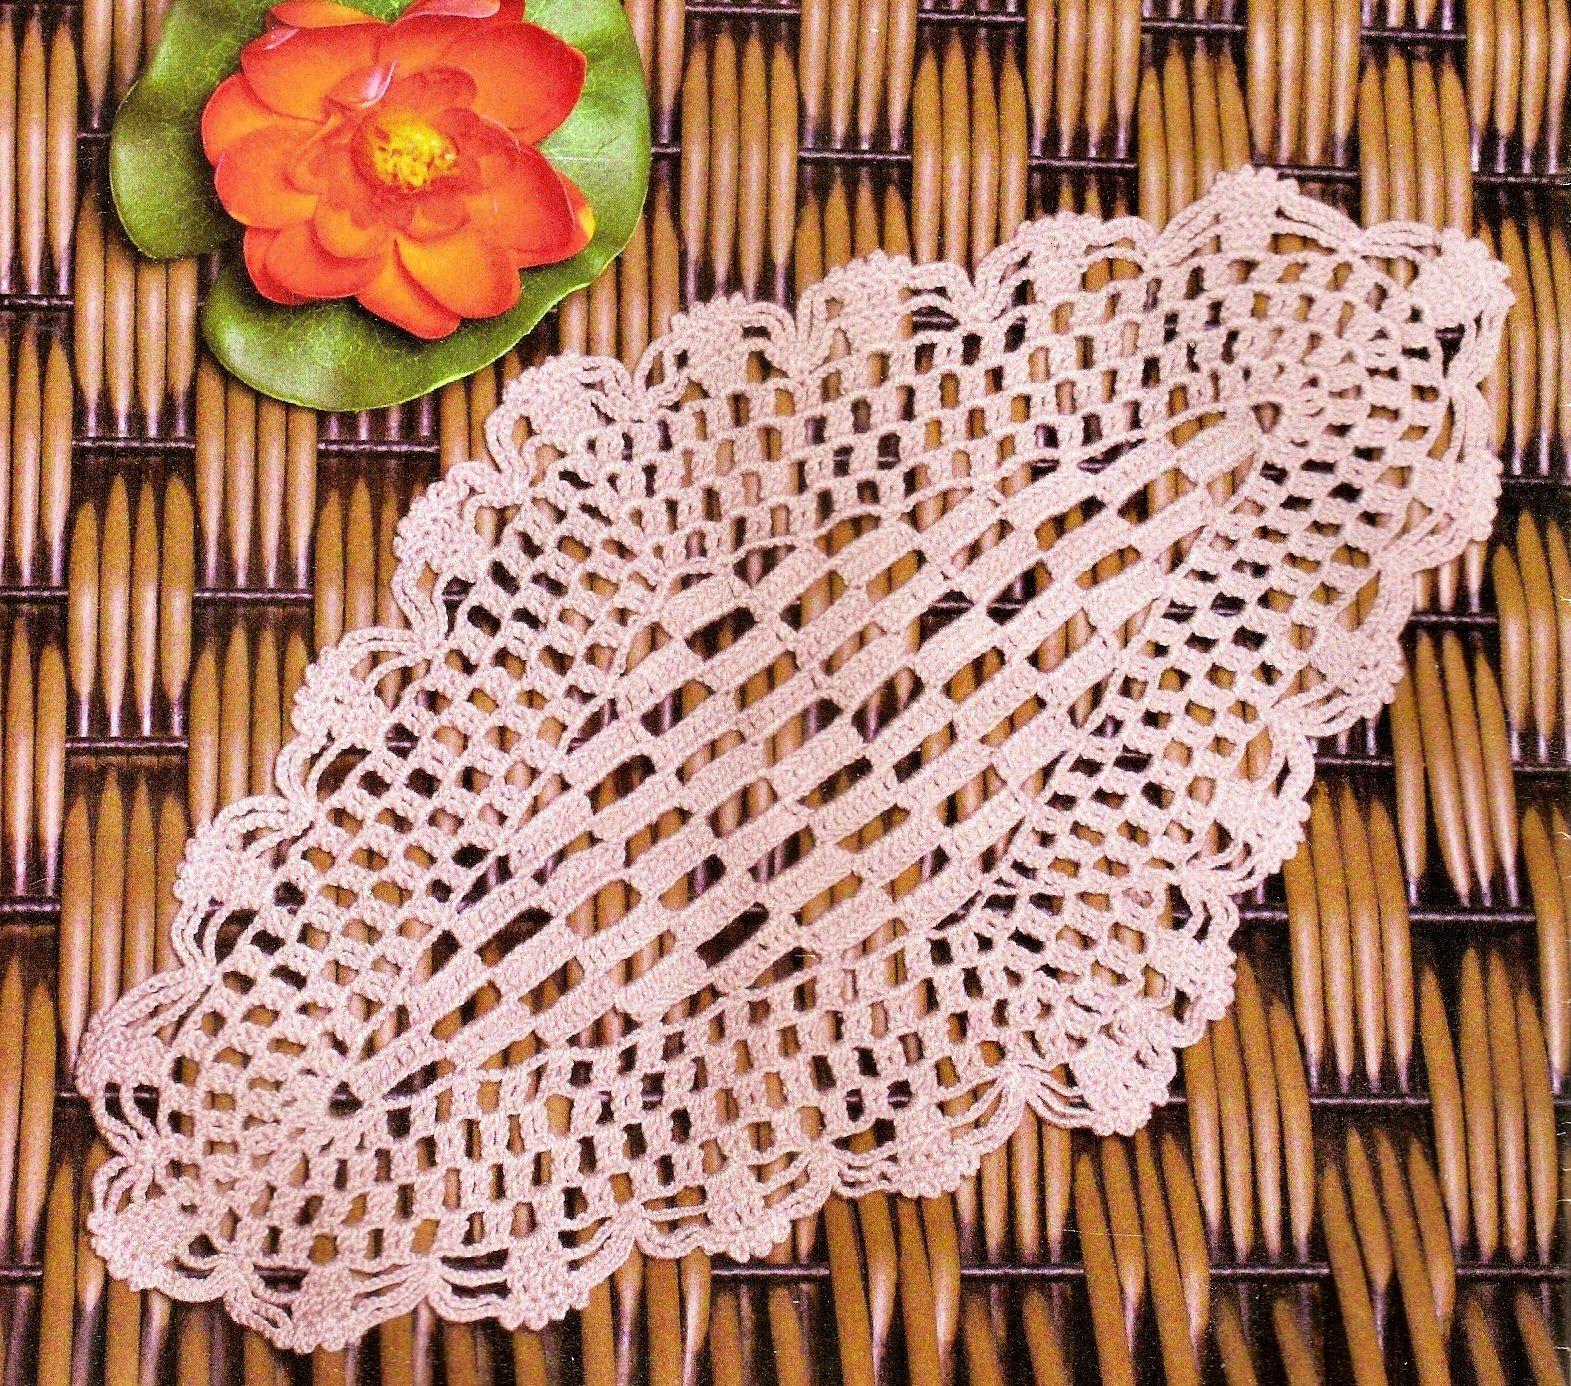 ovalada exotica toallita crochet en crochet con los ingresos ...